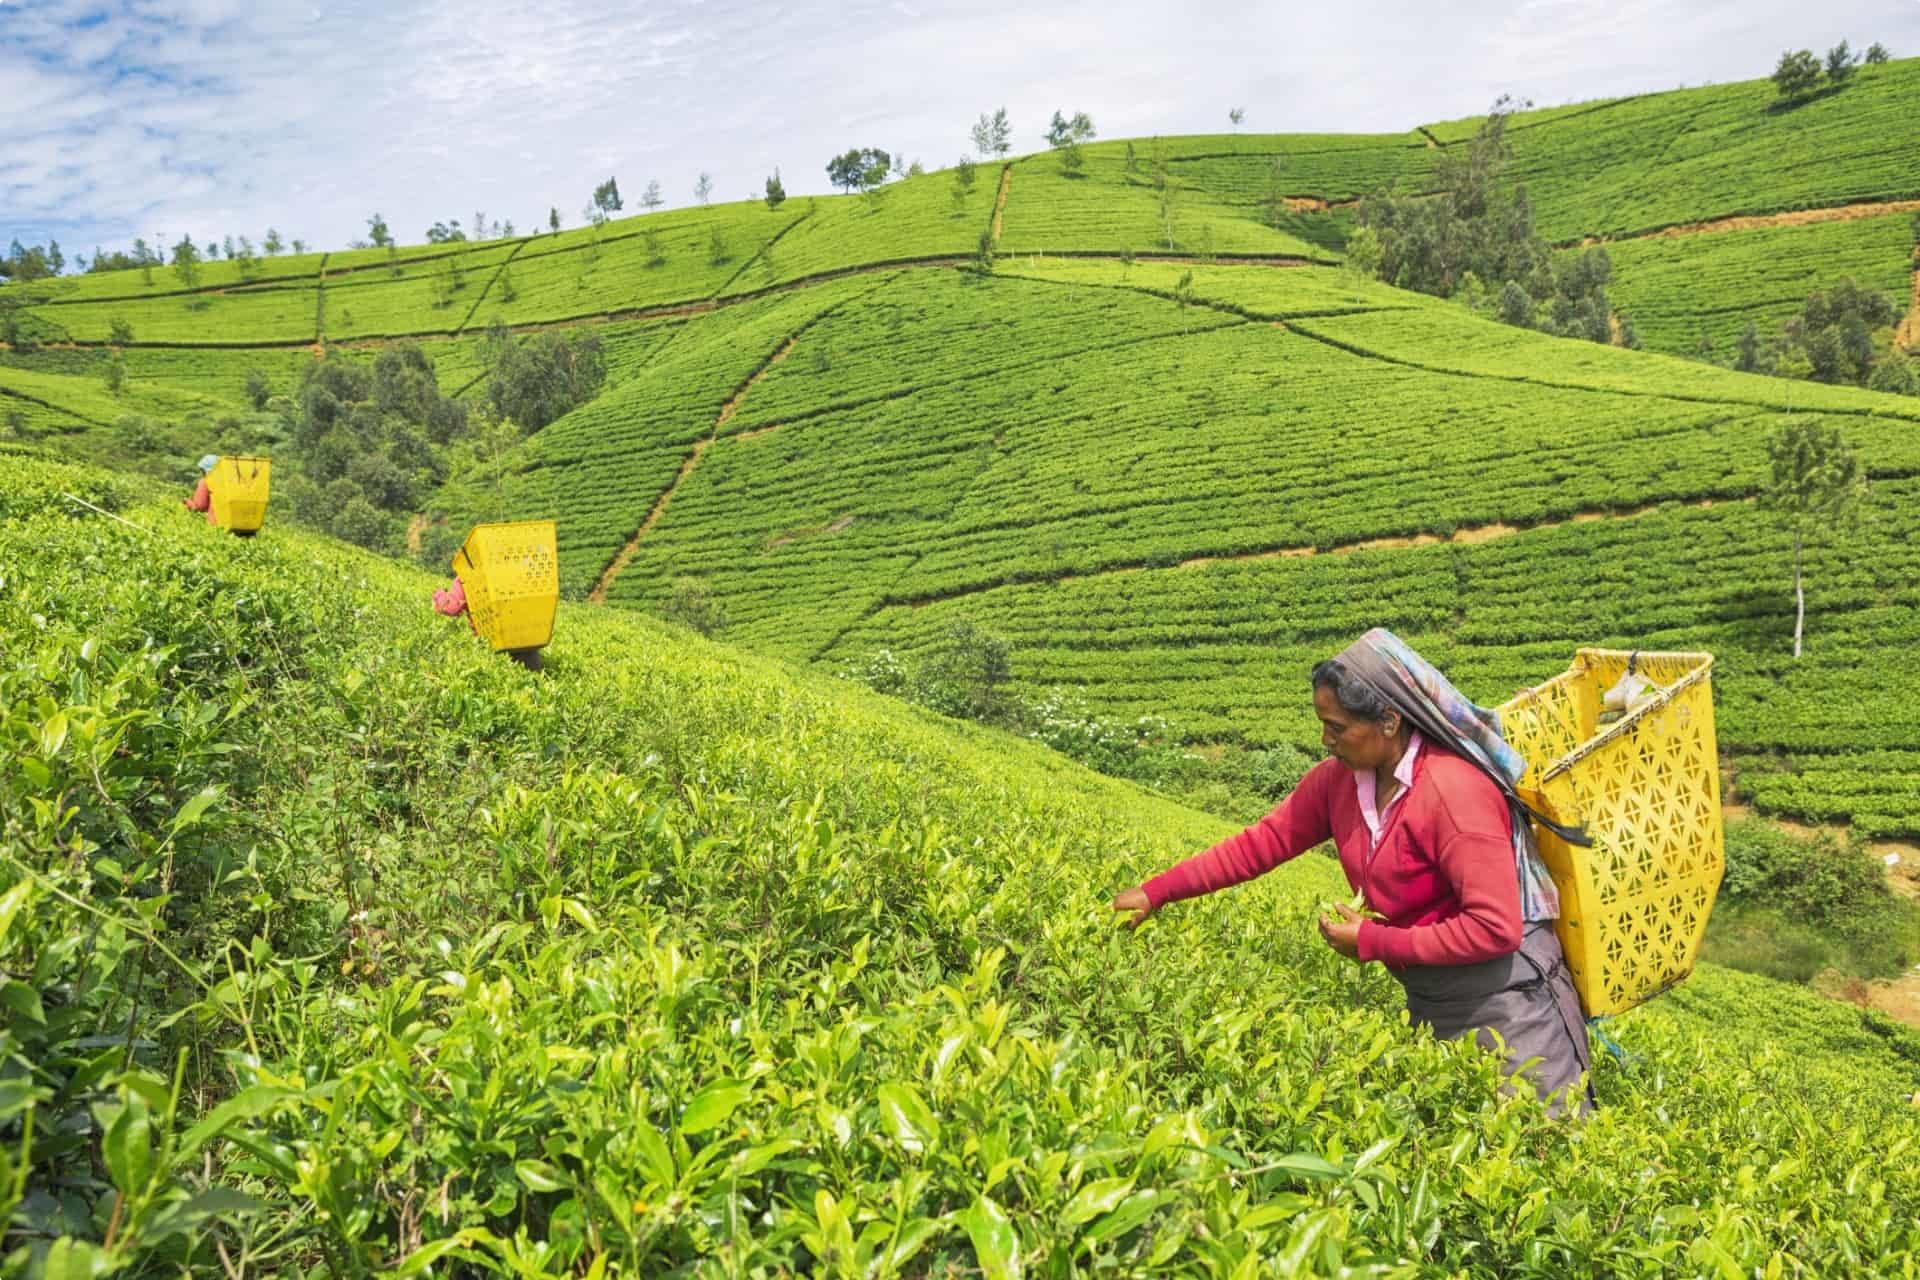 Workers at a tea plantation in Nuwara Eliya